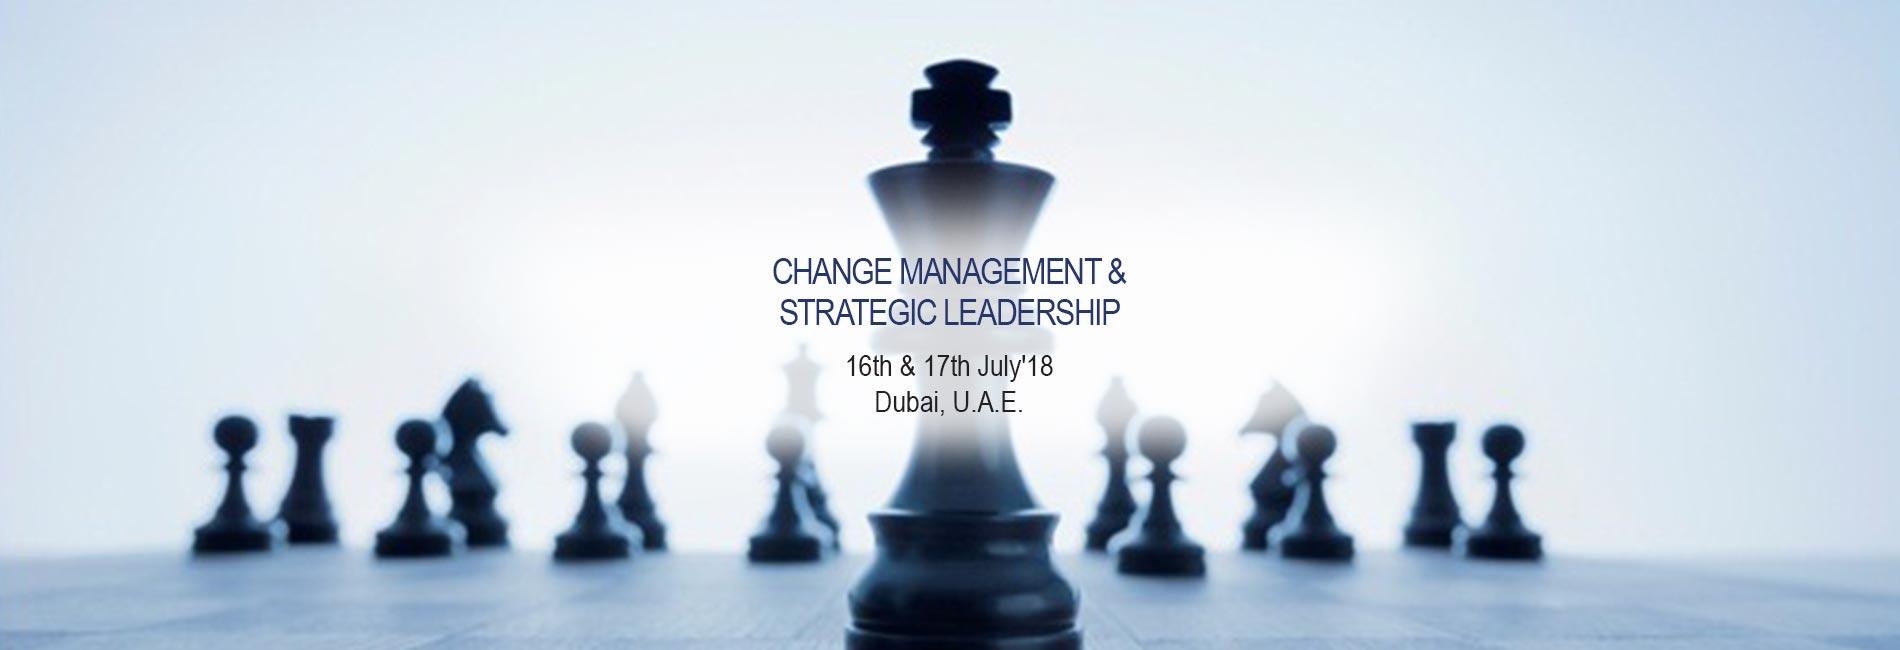 Change Management & Strategic Leadership